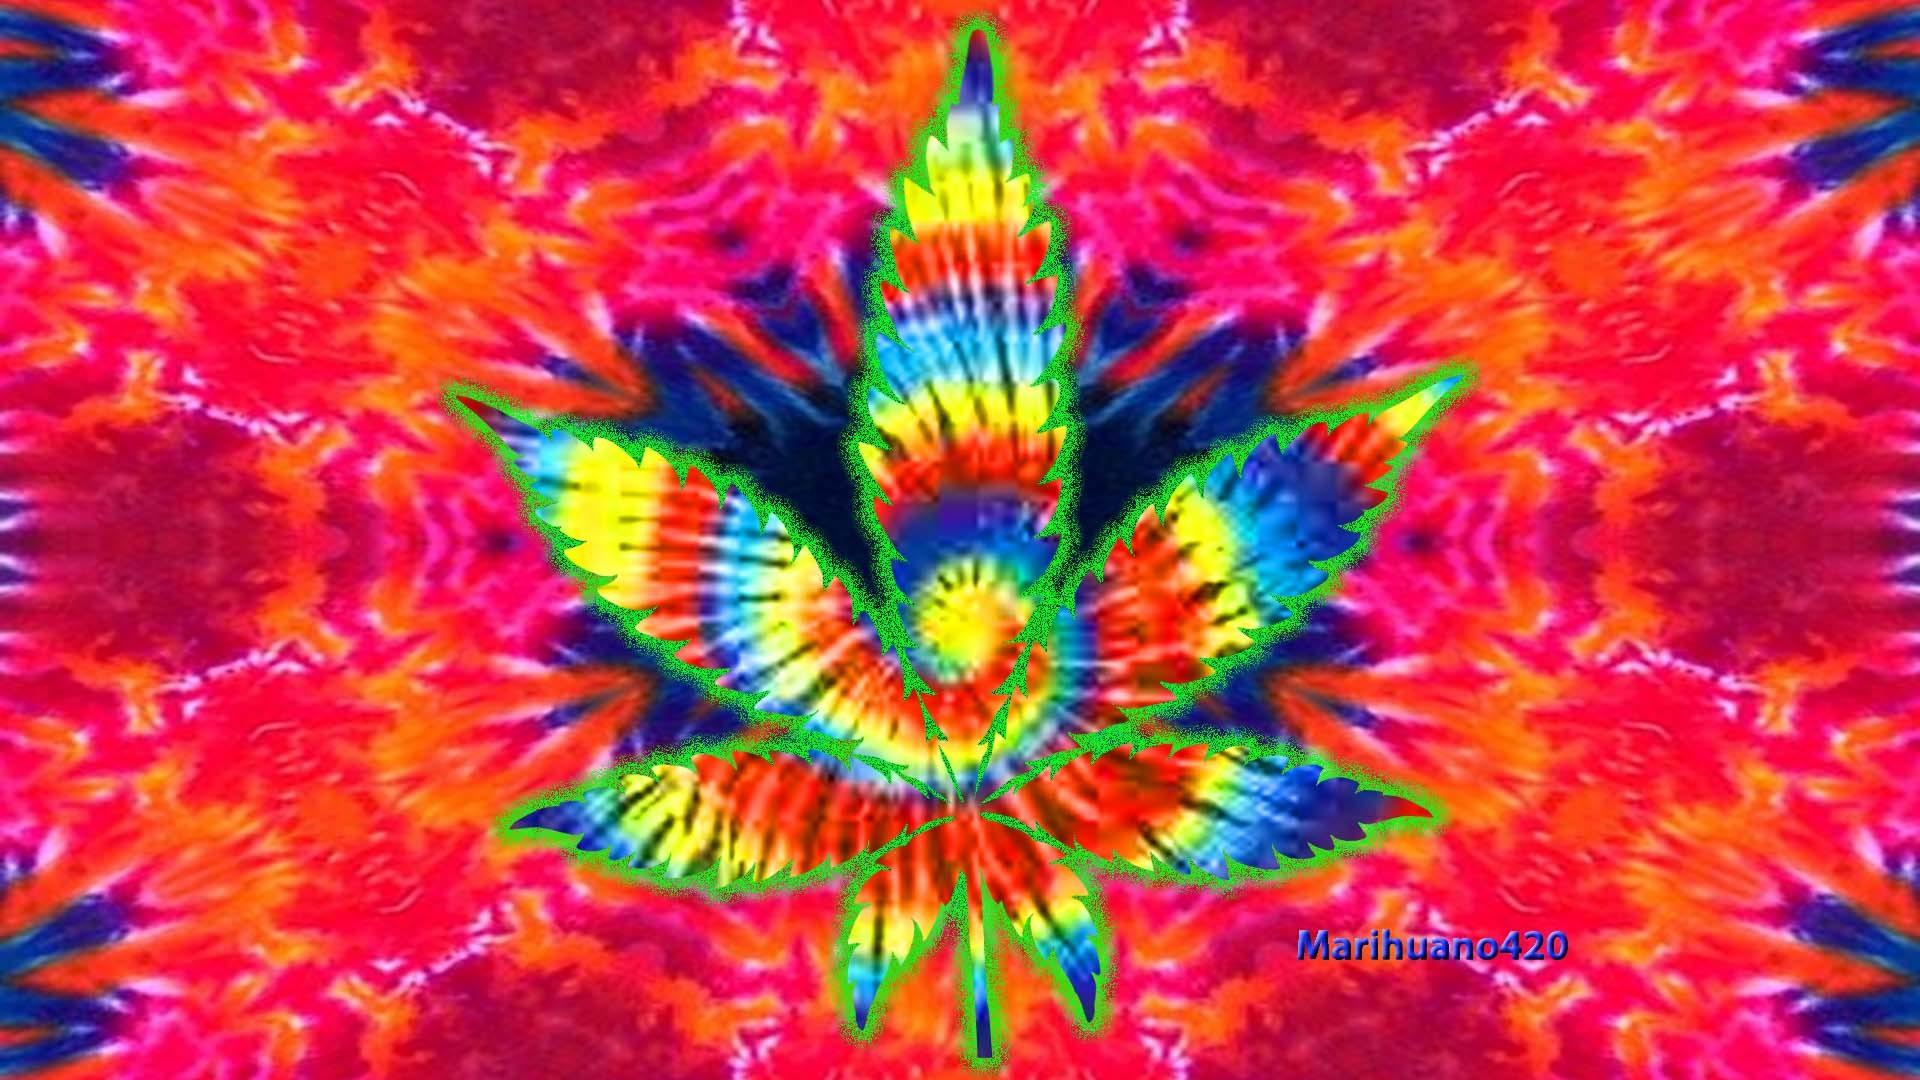 Hippie Wallpaper Weed, wallpaper, Hippie Wallpaper Weed hd wallpaper .